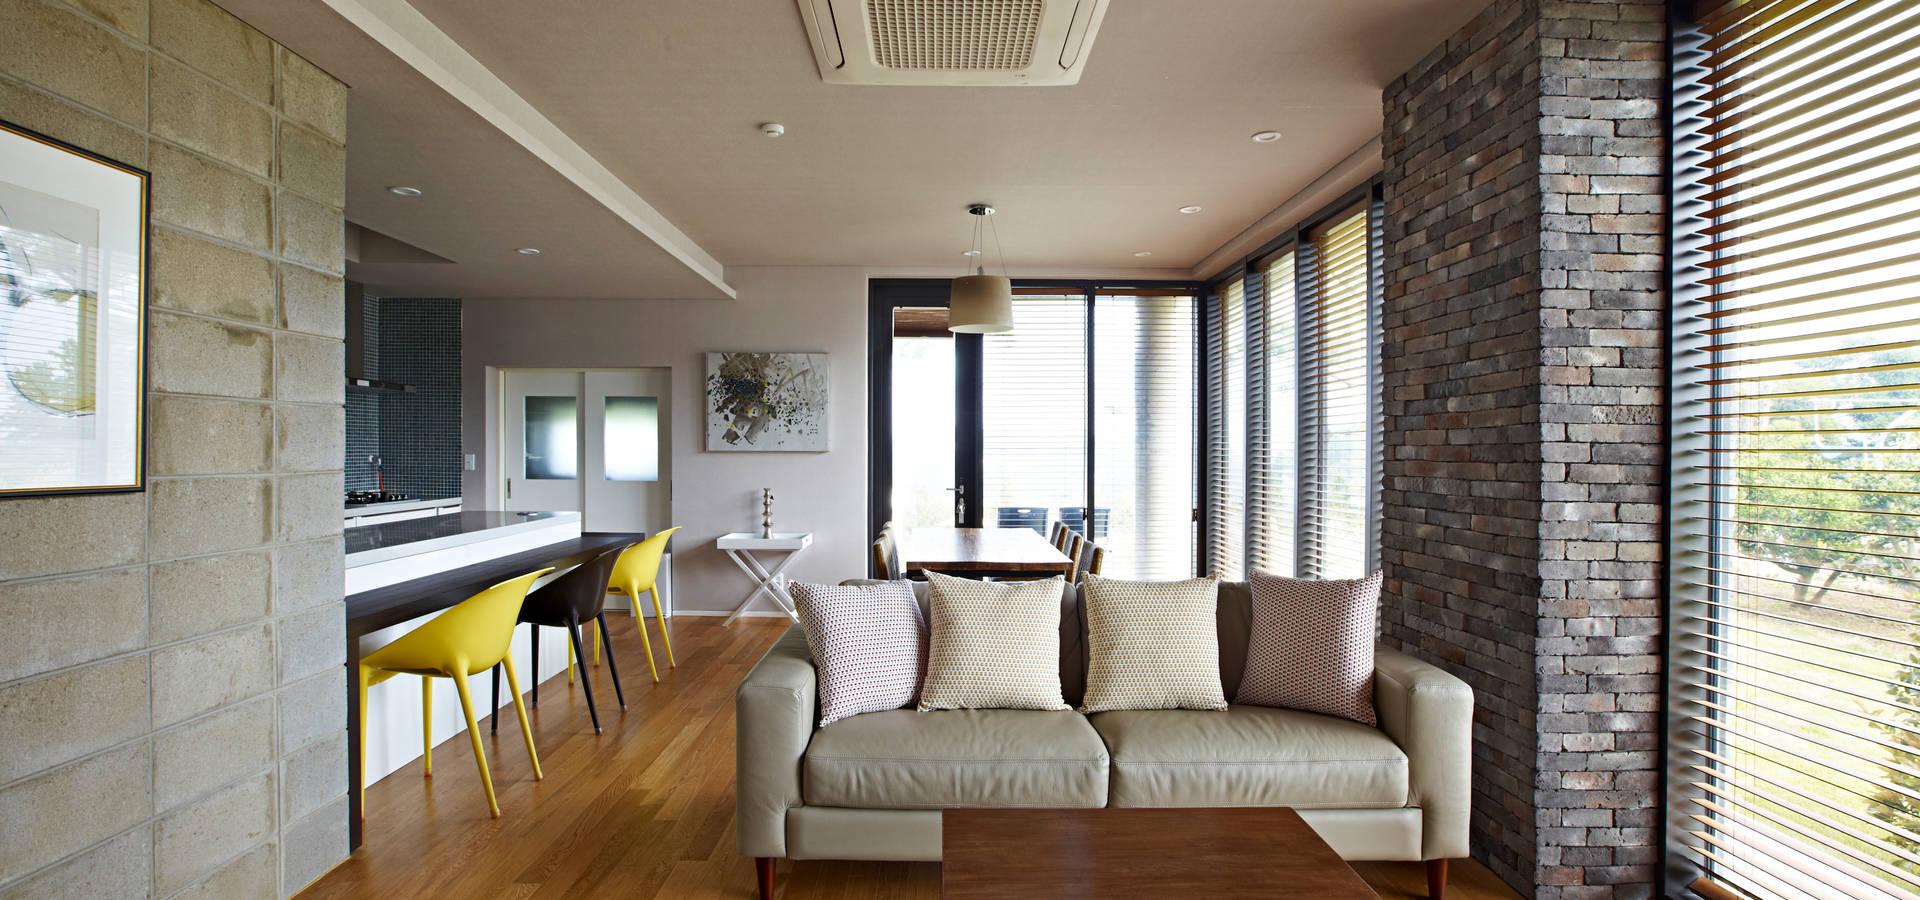 johsungwook architects